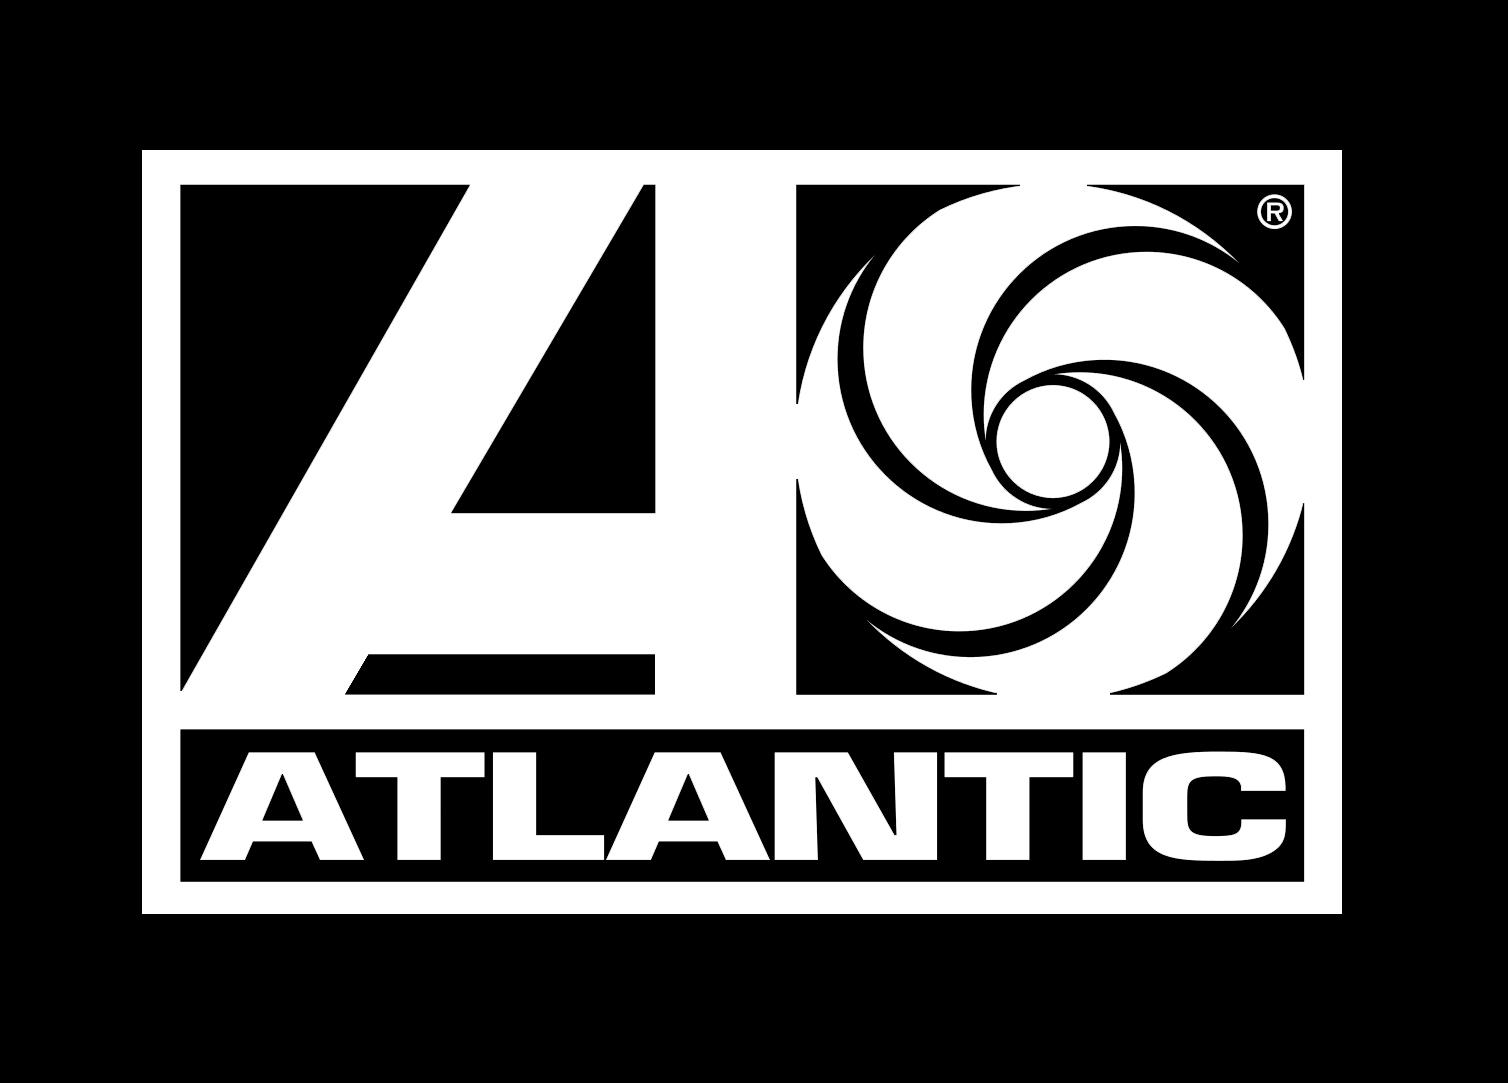 AtlanticRecords_TheSyndicate_Marketing.jpg